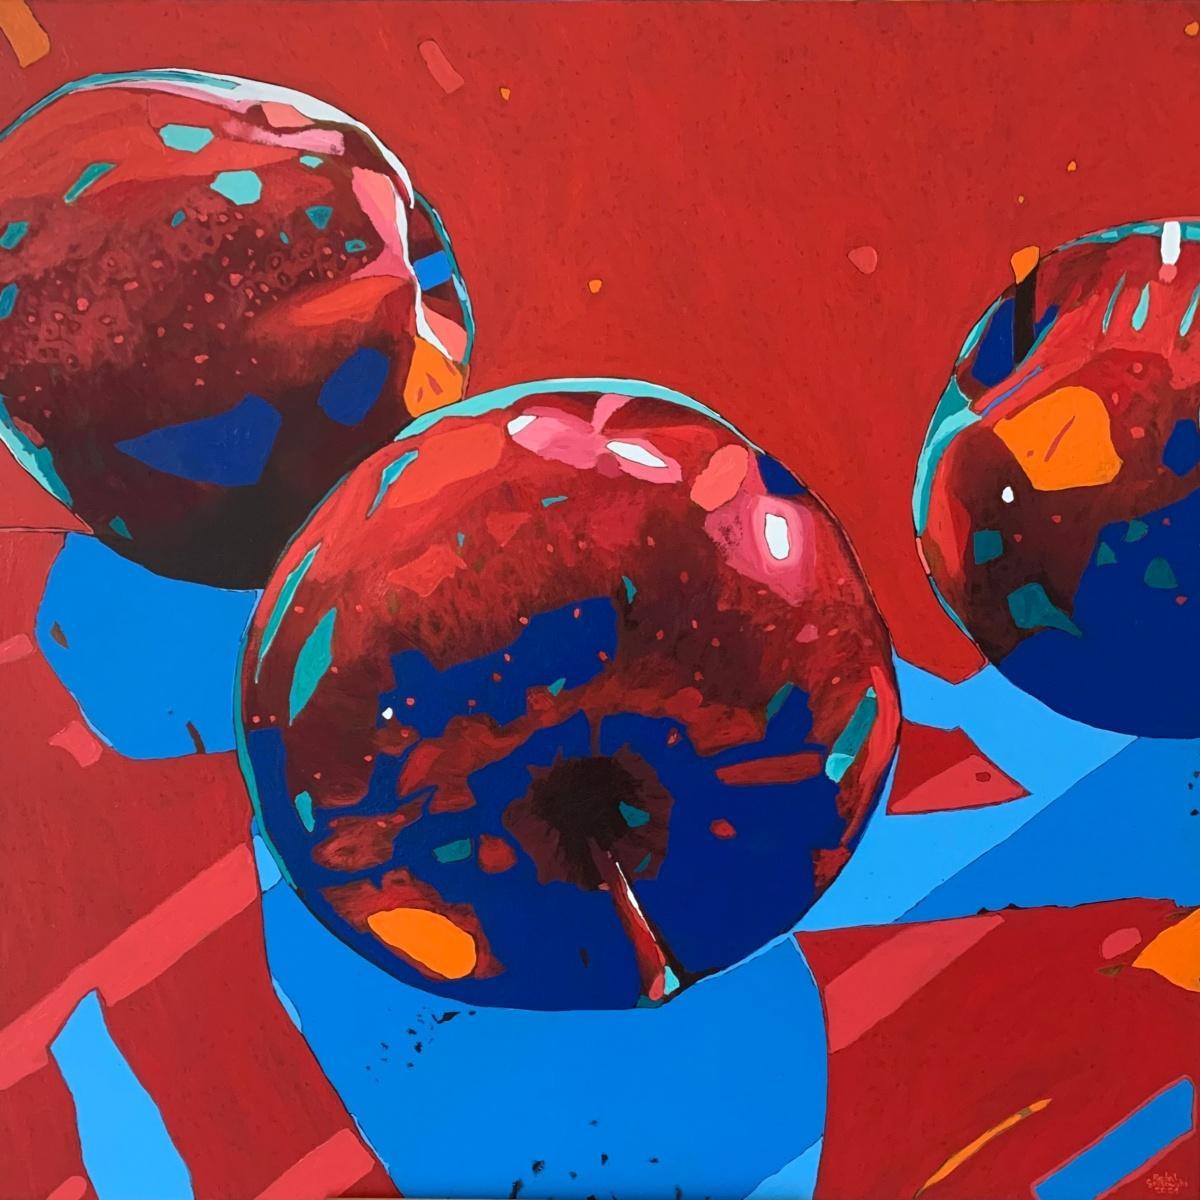 Apples 19 - Oil painting, Contemporary Figurative, Pop art, Still life